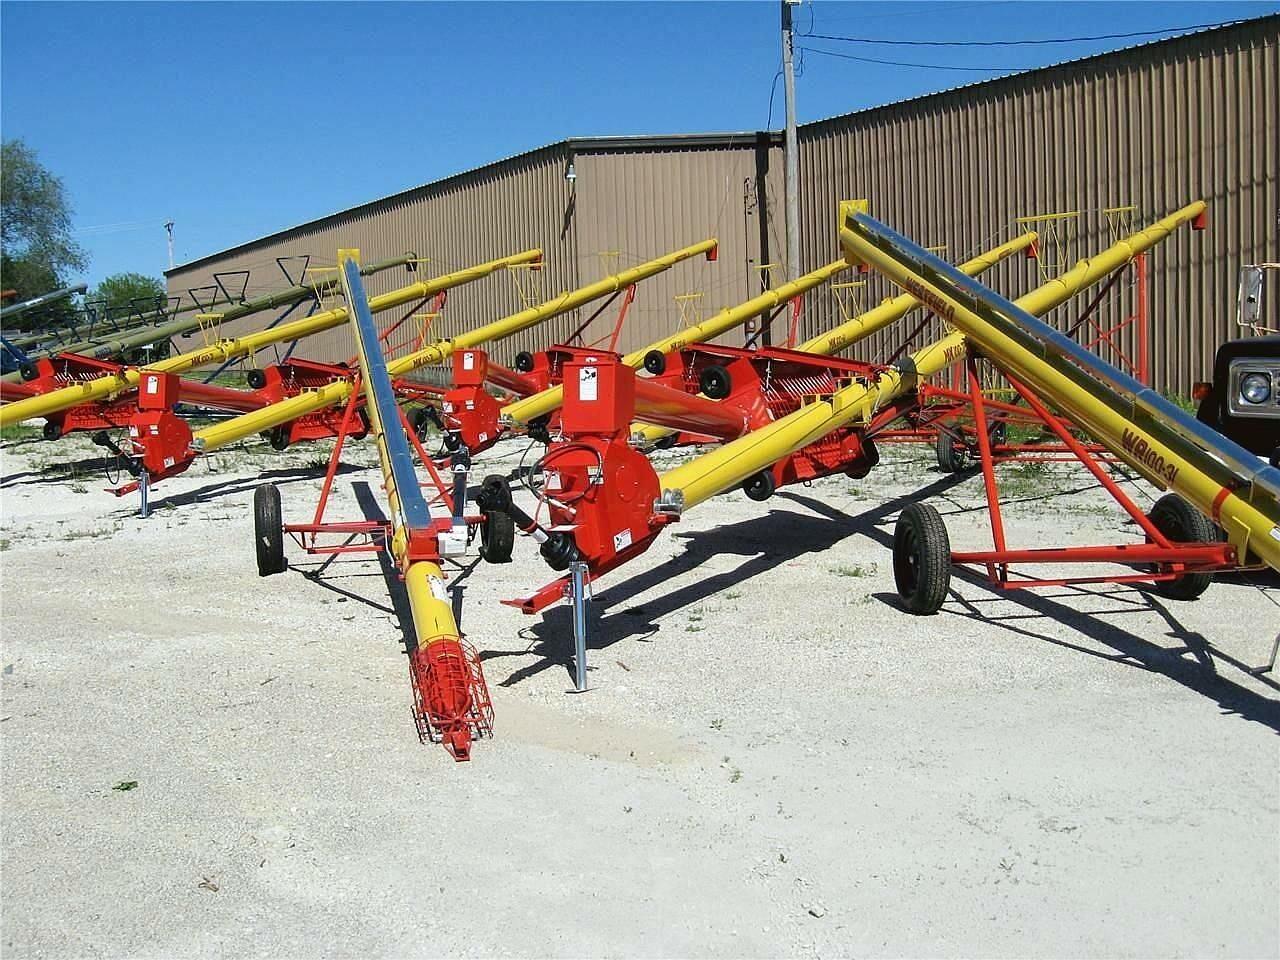 Westfield MKX100-63 Augers and Conveyor